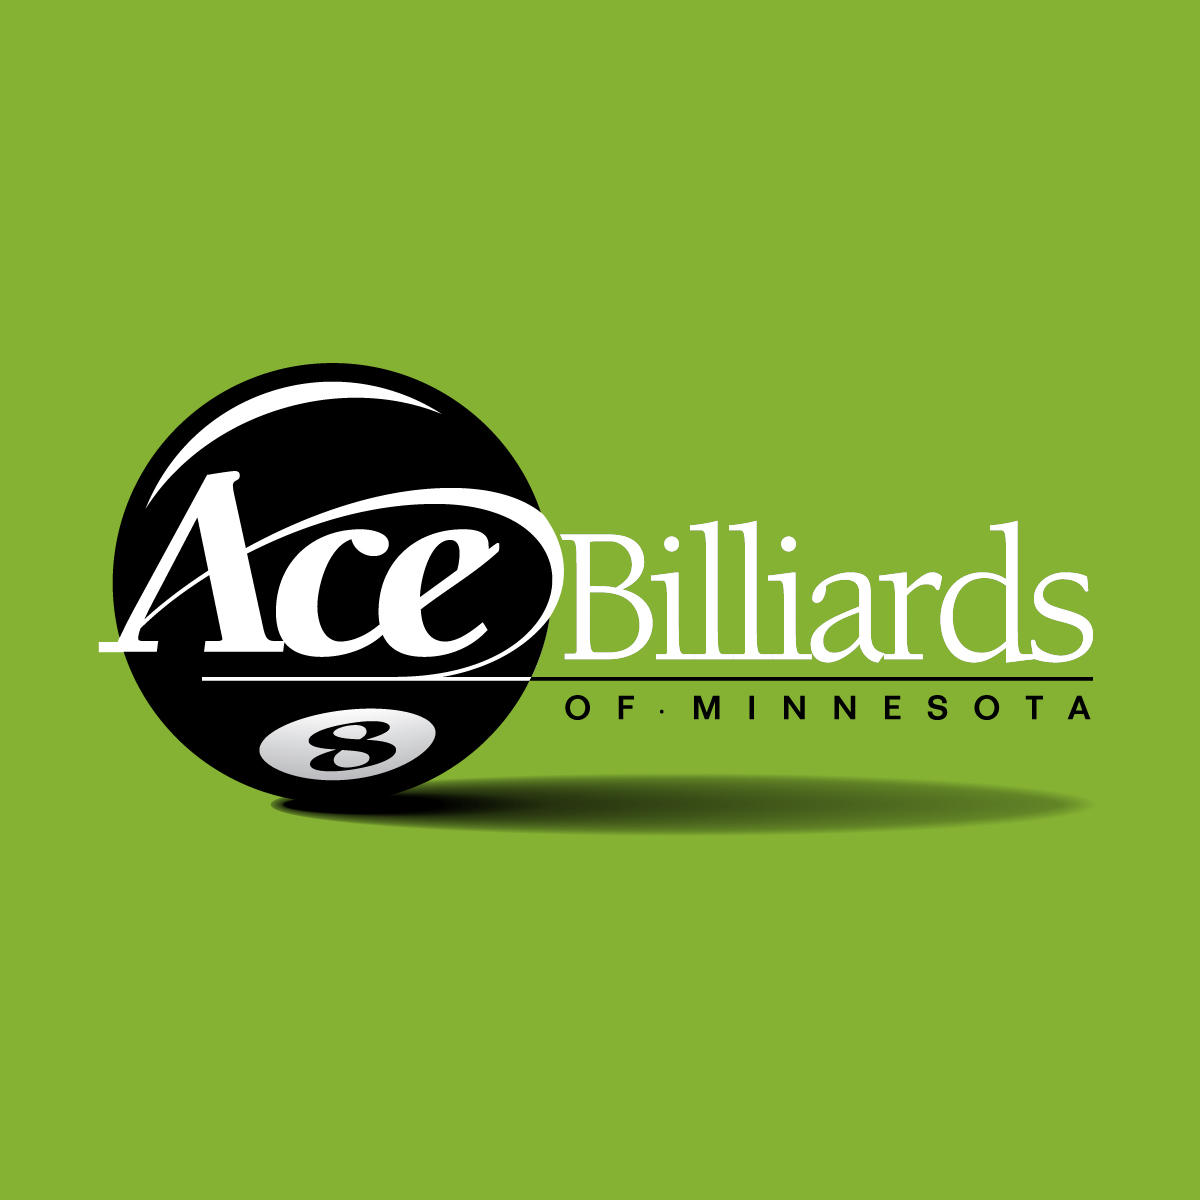 Ace Billiards of Minnesota, Inc.